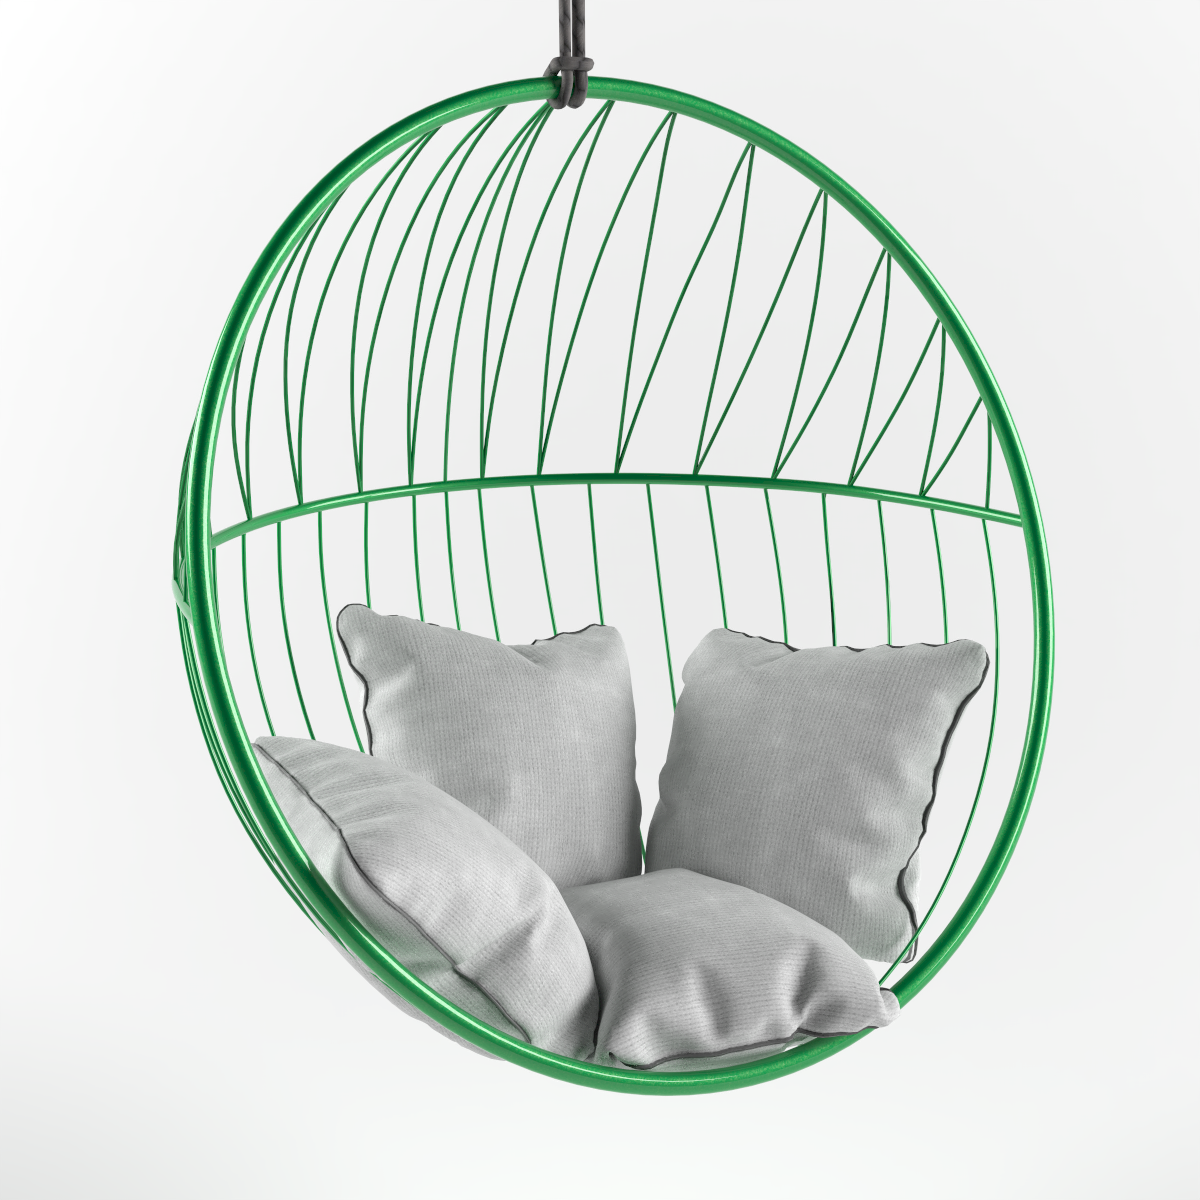 Bubble Hanging Chair 3d ˪¨ë¸ In ̝˜ìž 3dexport